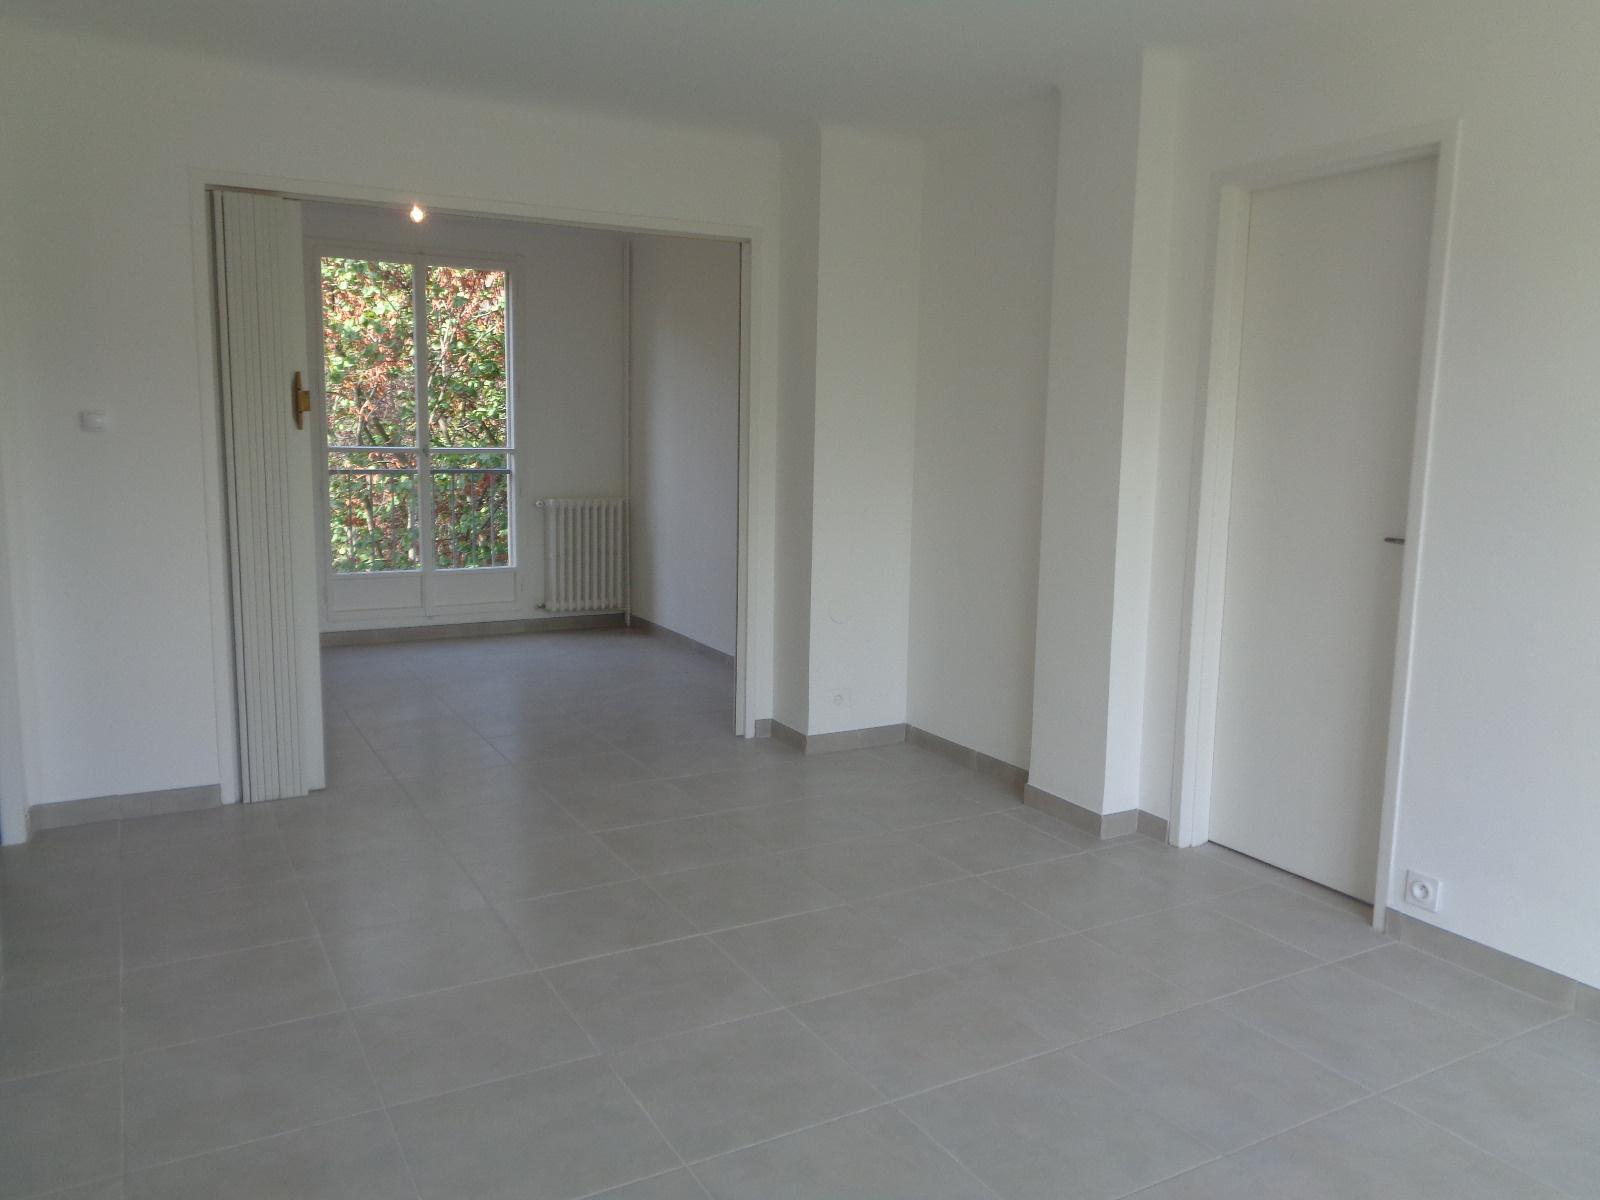 location appartement aix en provence location studio t2. Black Bedroom Furniture Sets. Home Design Ideas